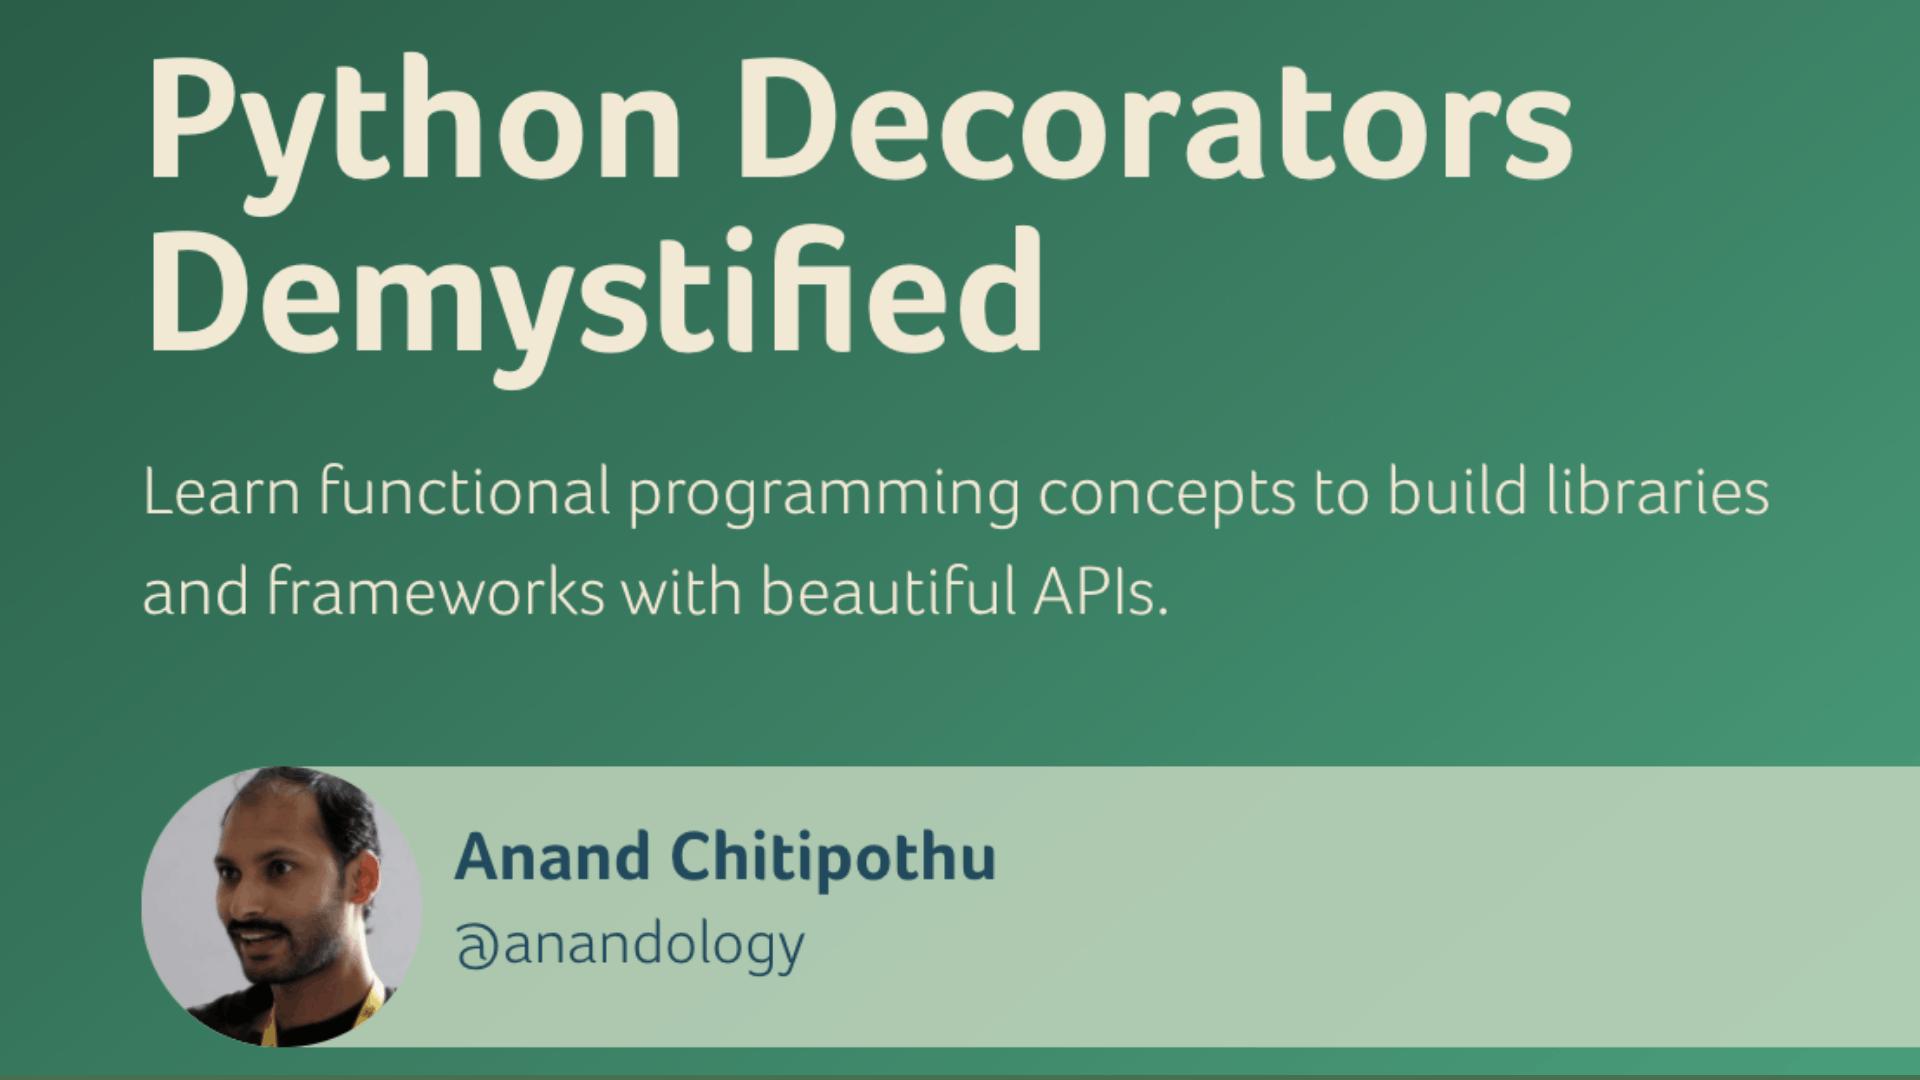 Python Decorators Demystified